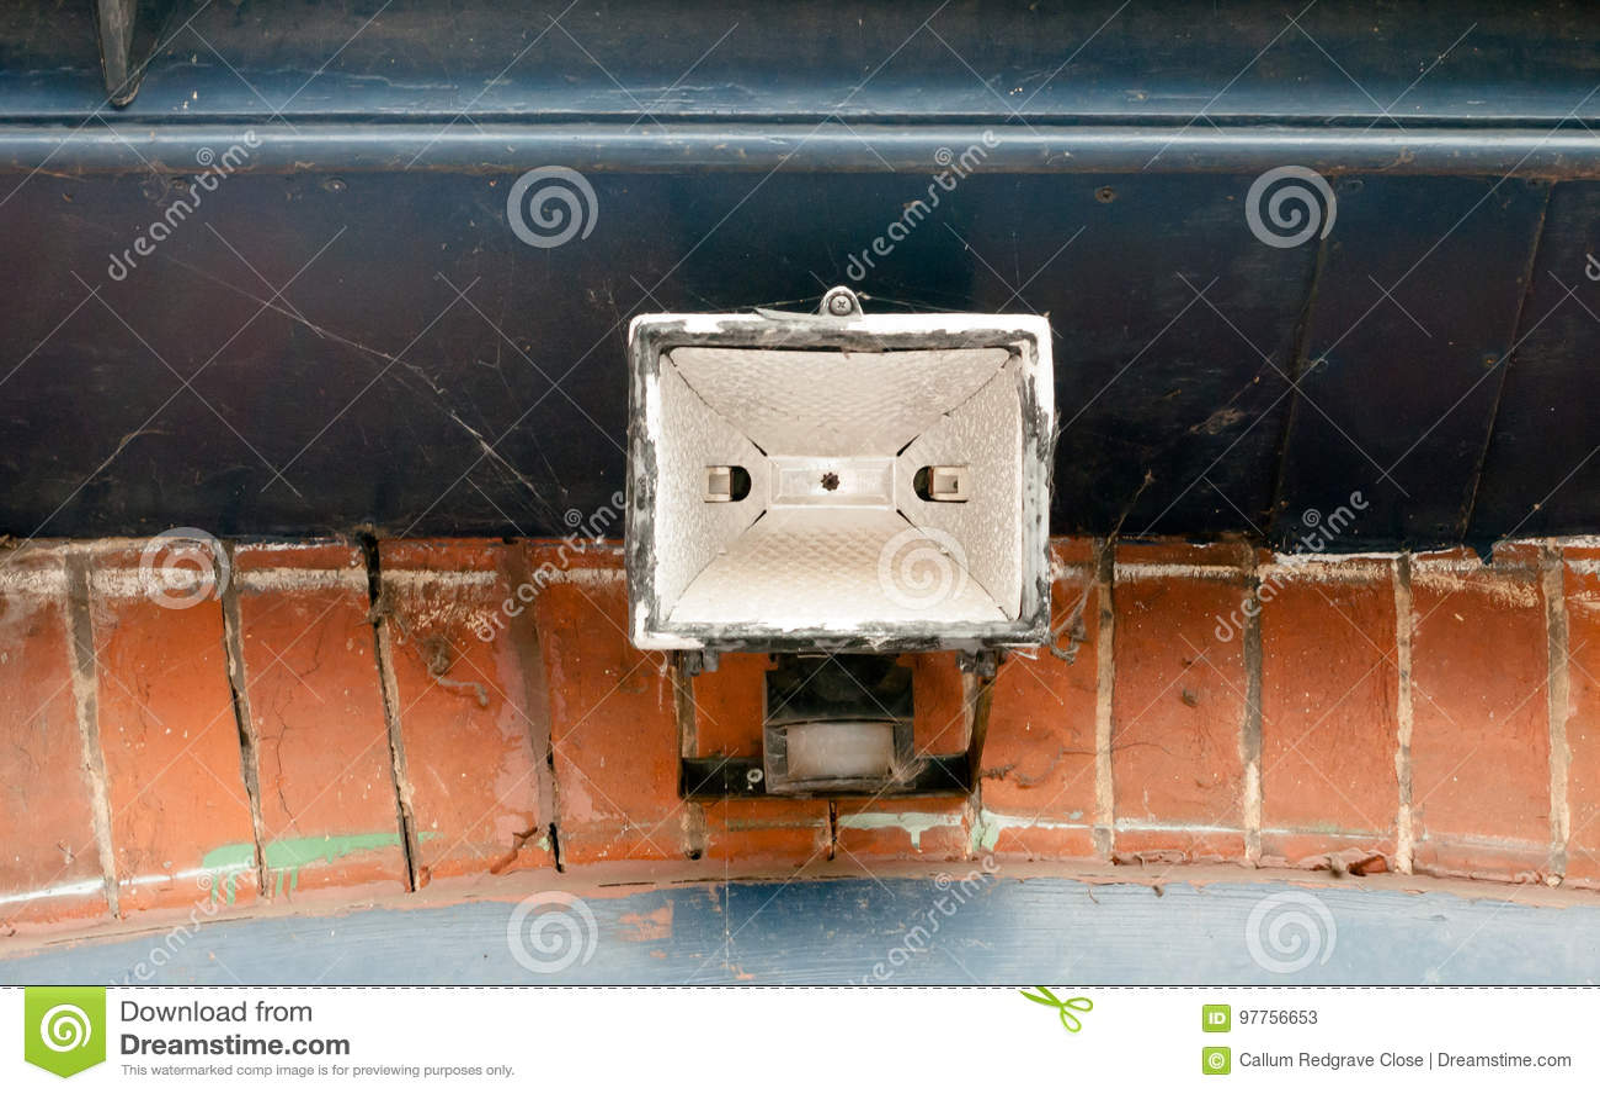 A Metal Overheard Lamp Outside Above Gate Stock Image